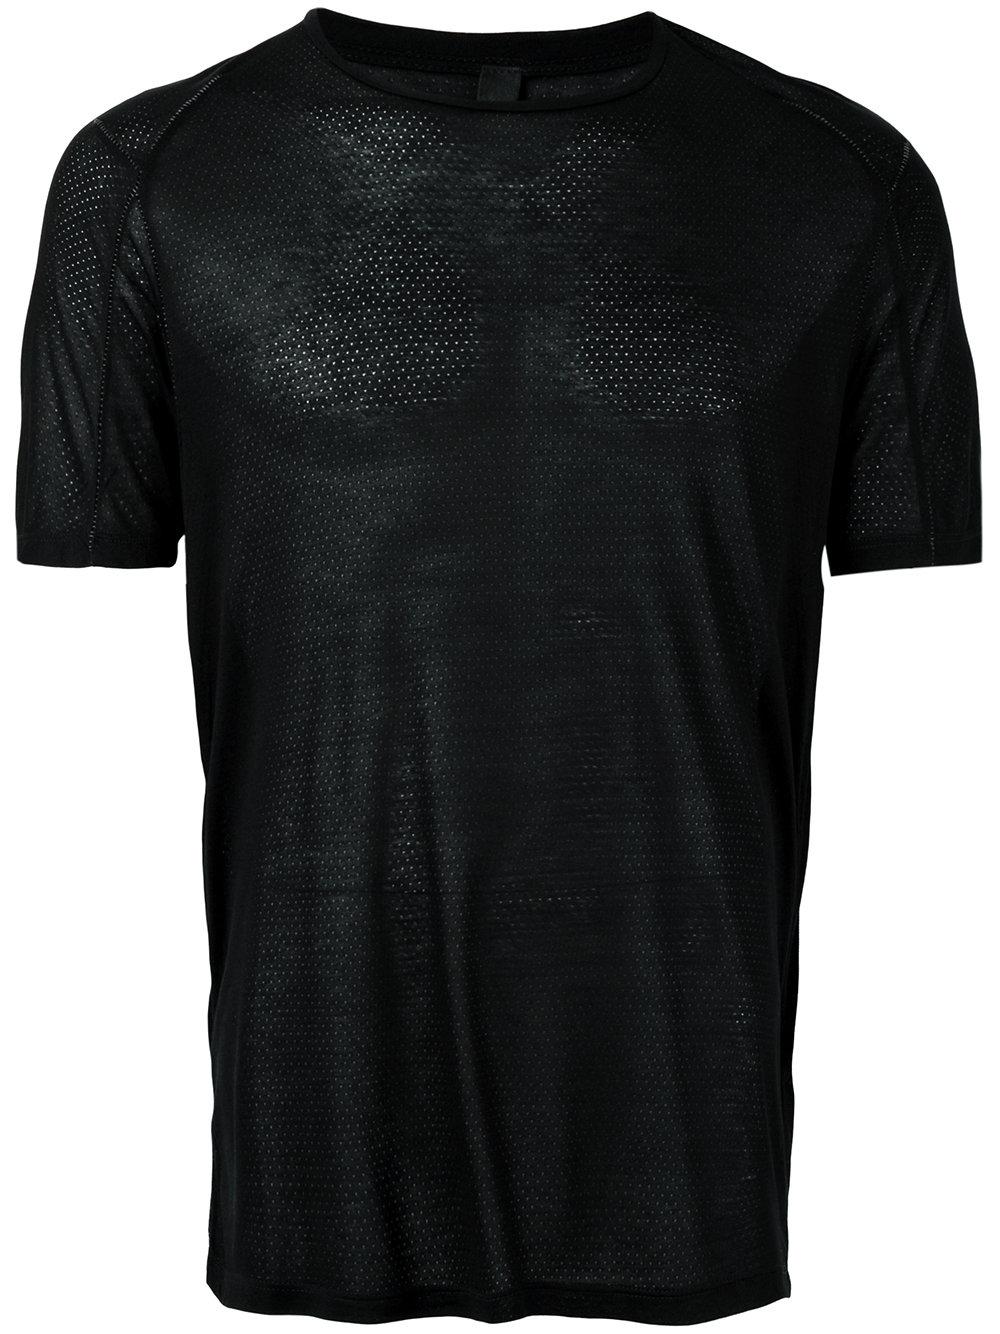 TOM-REBL-semi-sheer-T-shirt.jpg